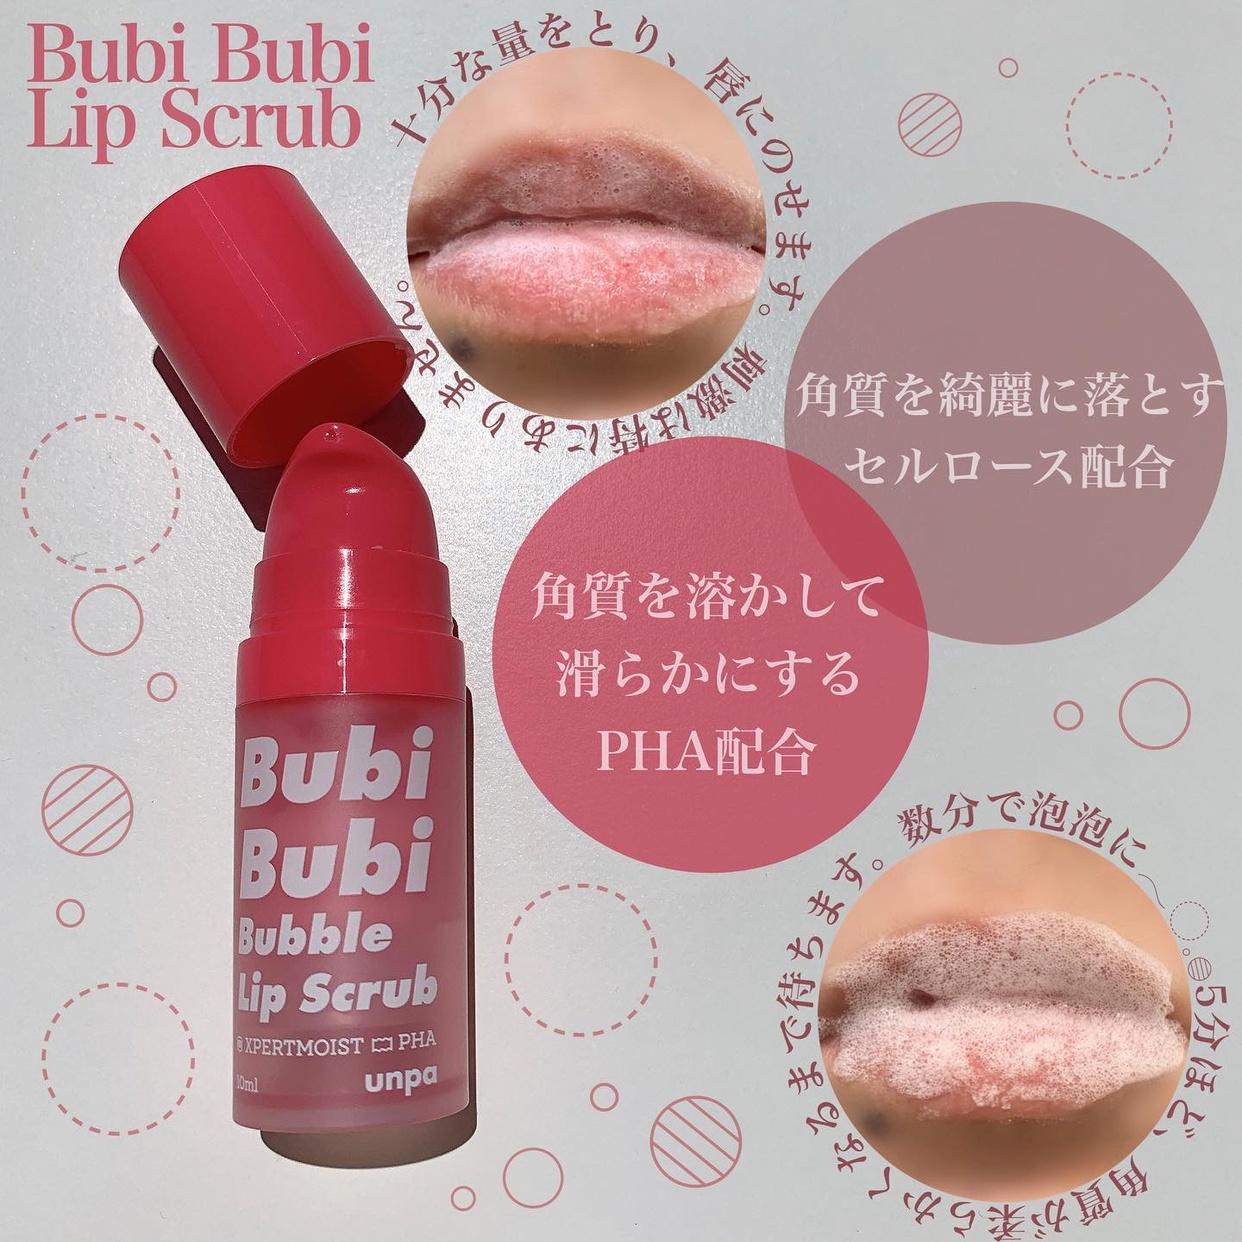 unpa.Cosmetics(オンパコスメティック)ブビブビリップ スクラブを使ったmaiさんのクチコミ画像1